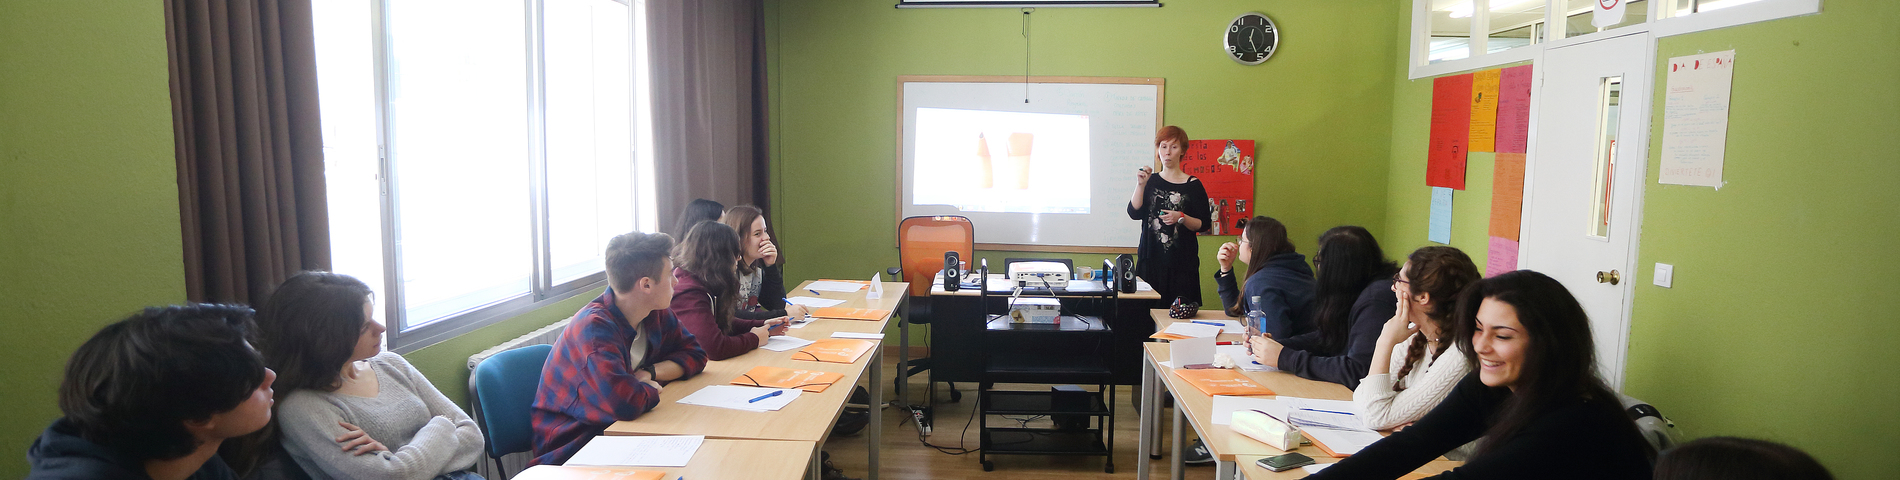 Academia Iria Flavia picture 1